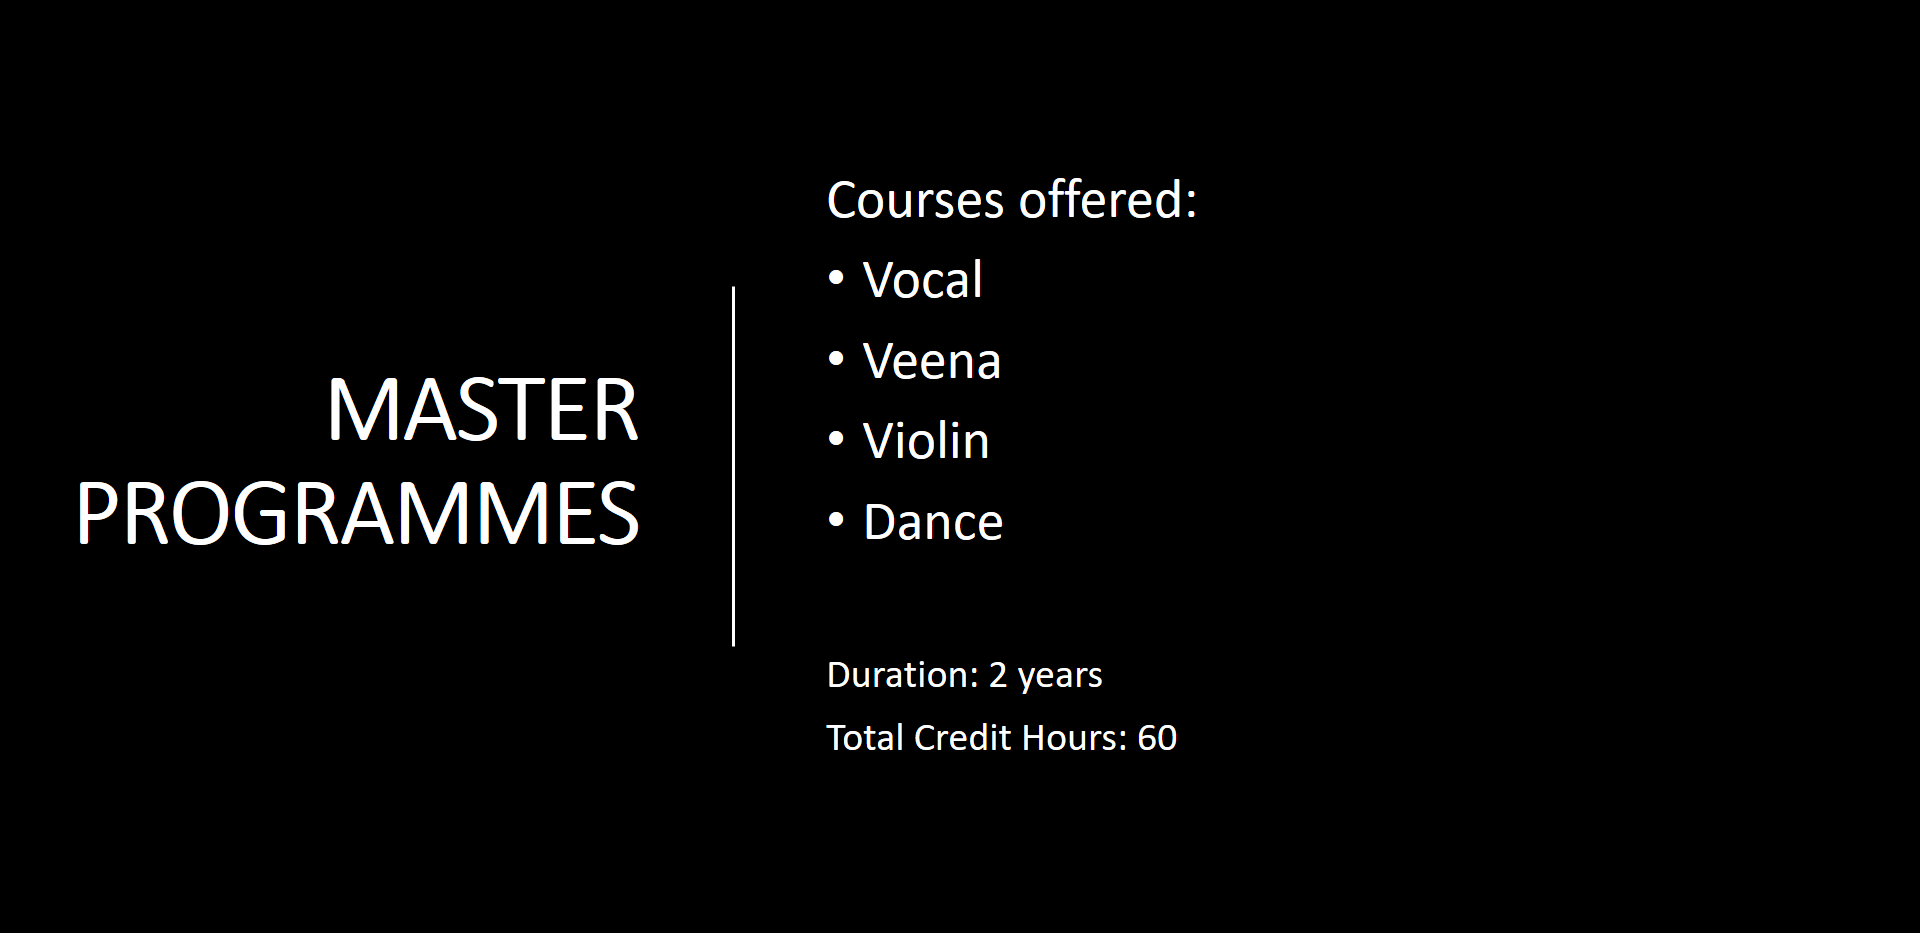 Master Programmes